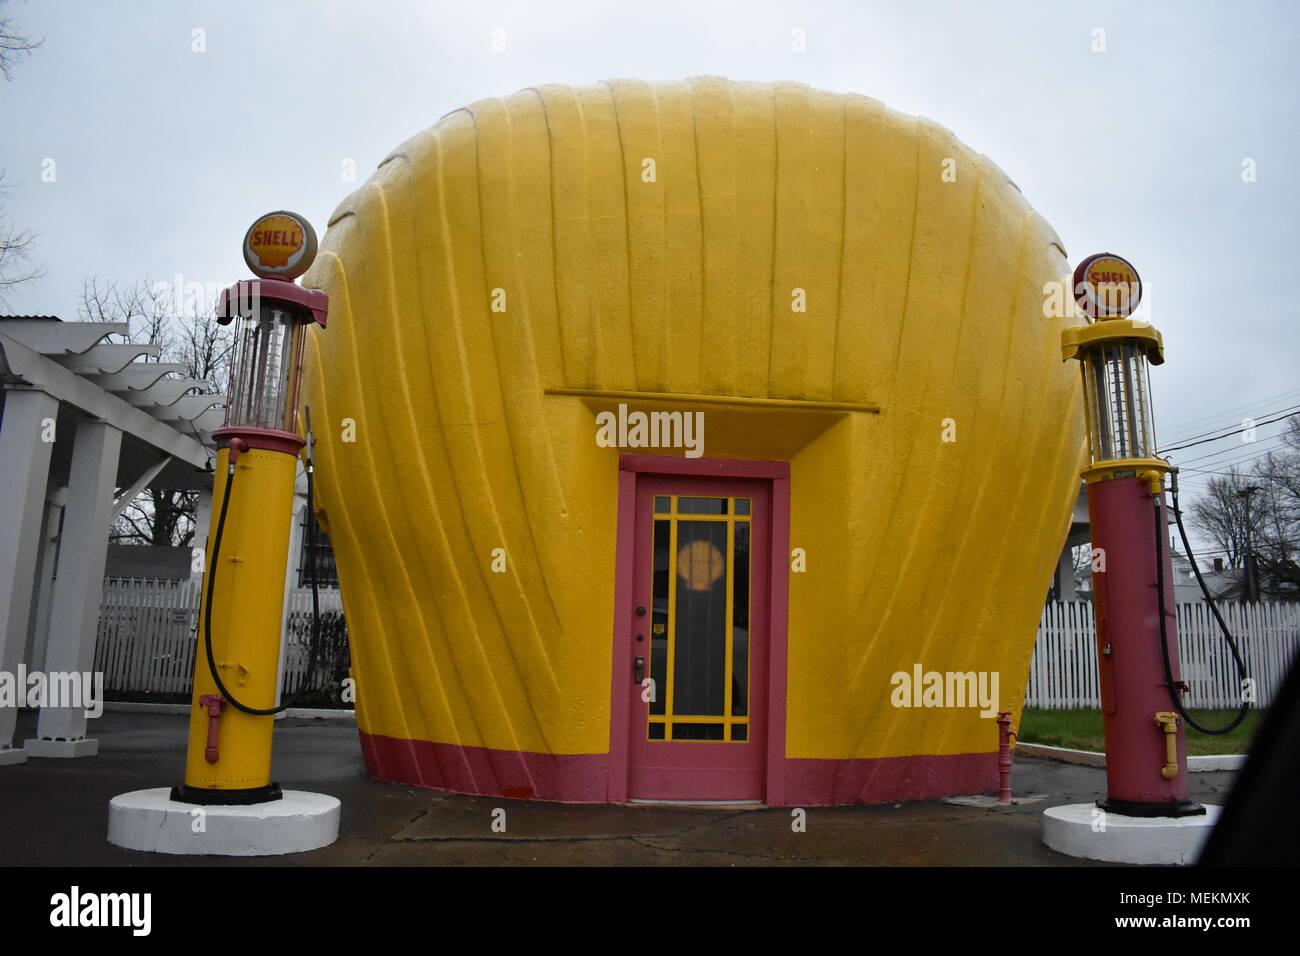 Original Shell Gas Station in Winston-Salem - Stock Image